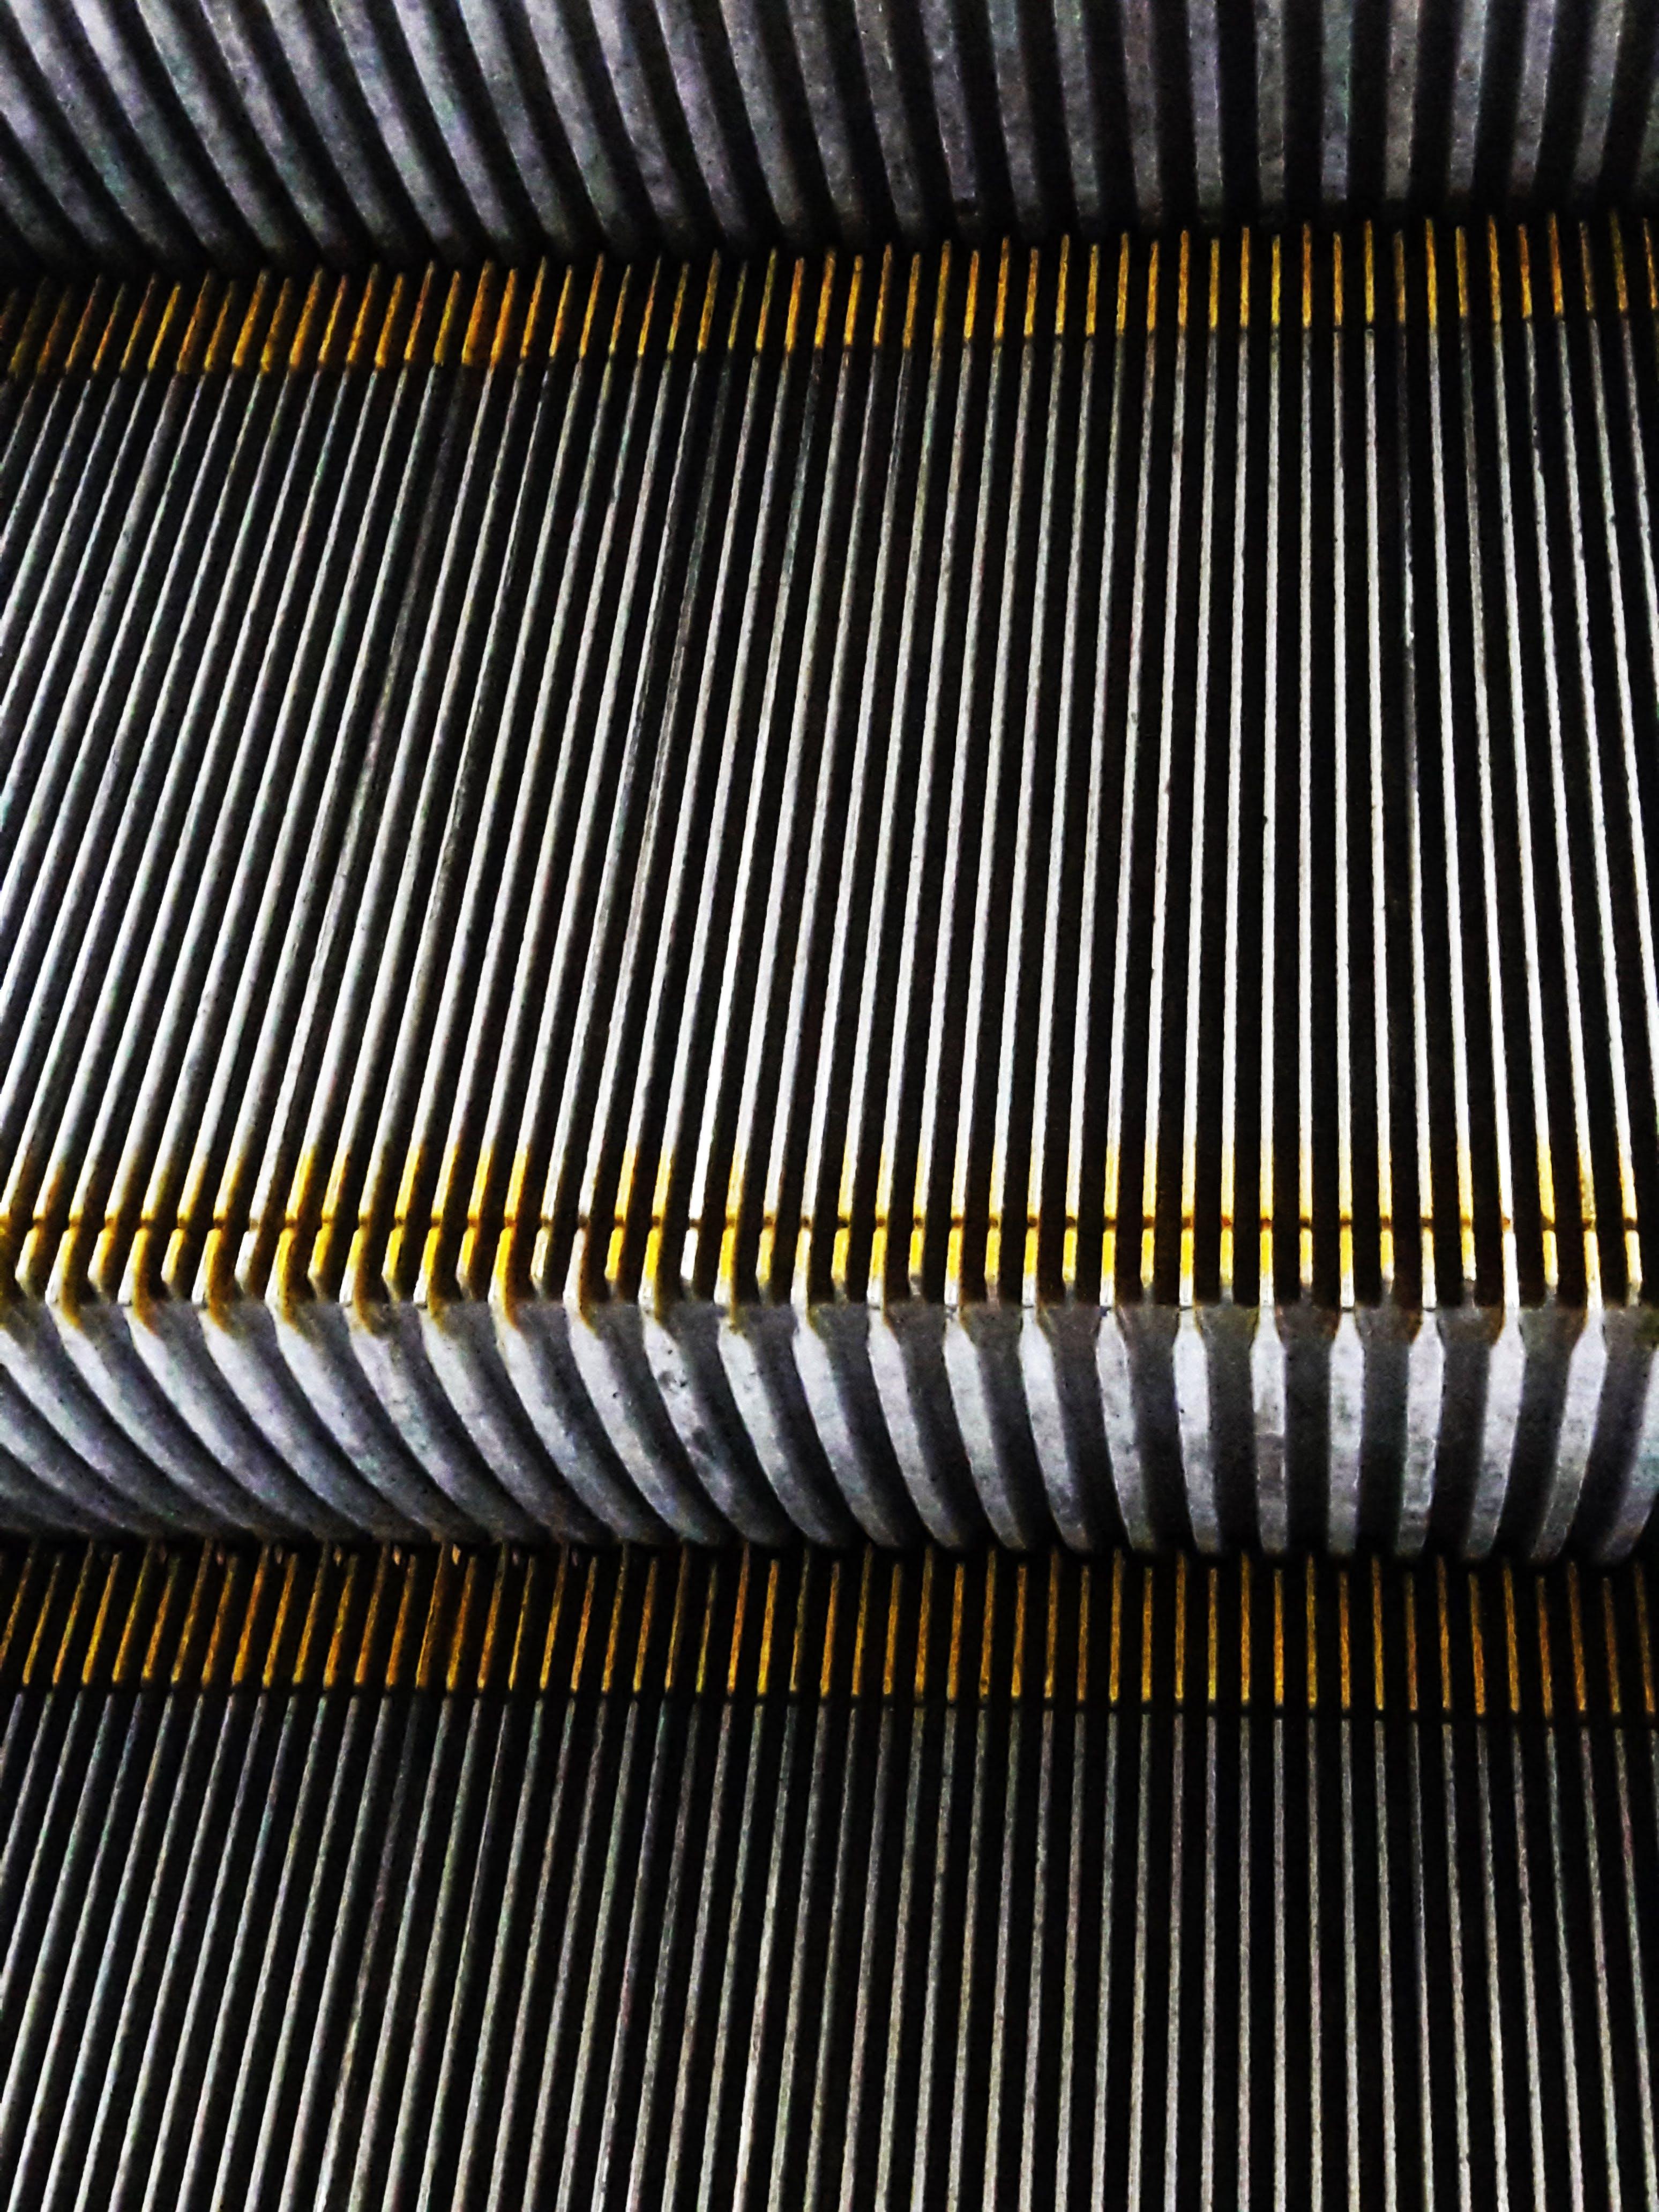 Free stock photo of escalator, industrial, metal surface, public transportation